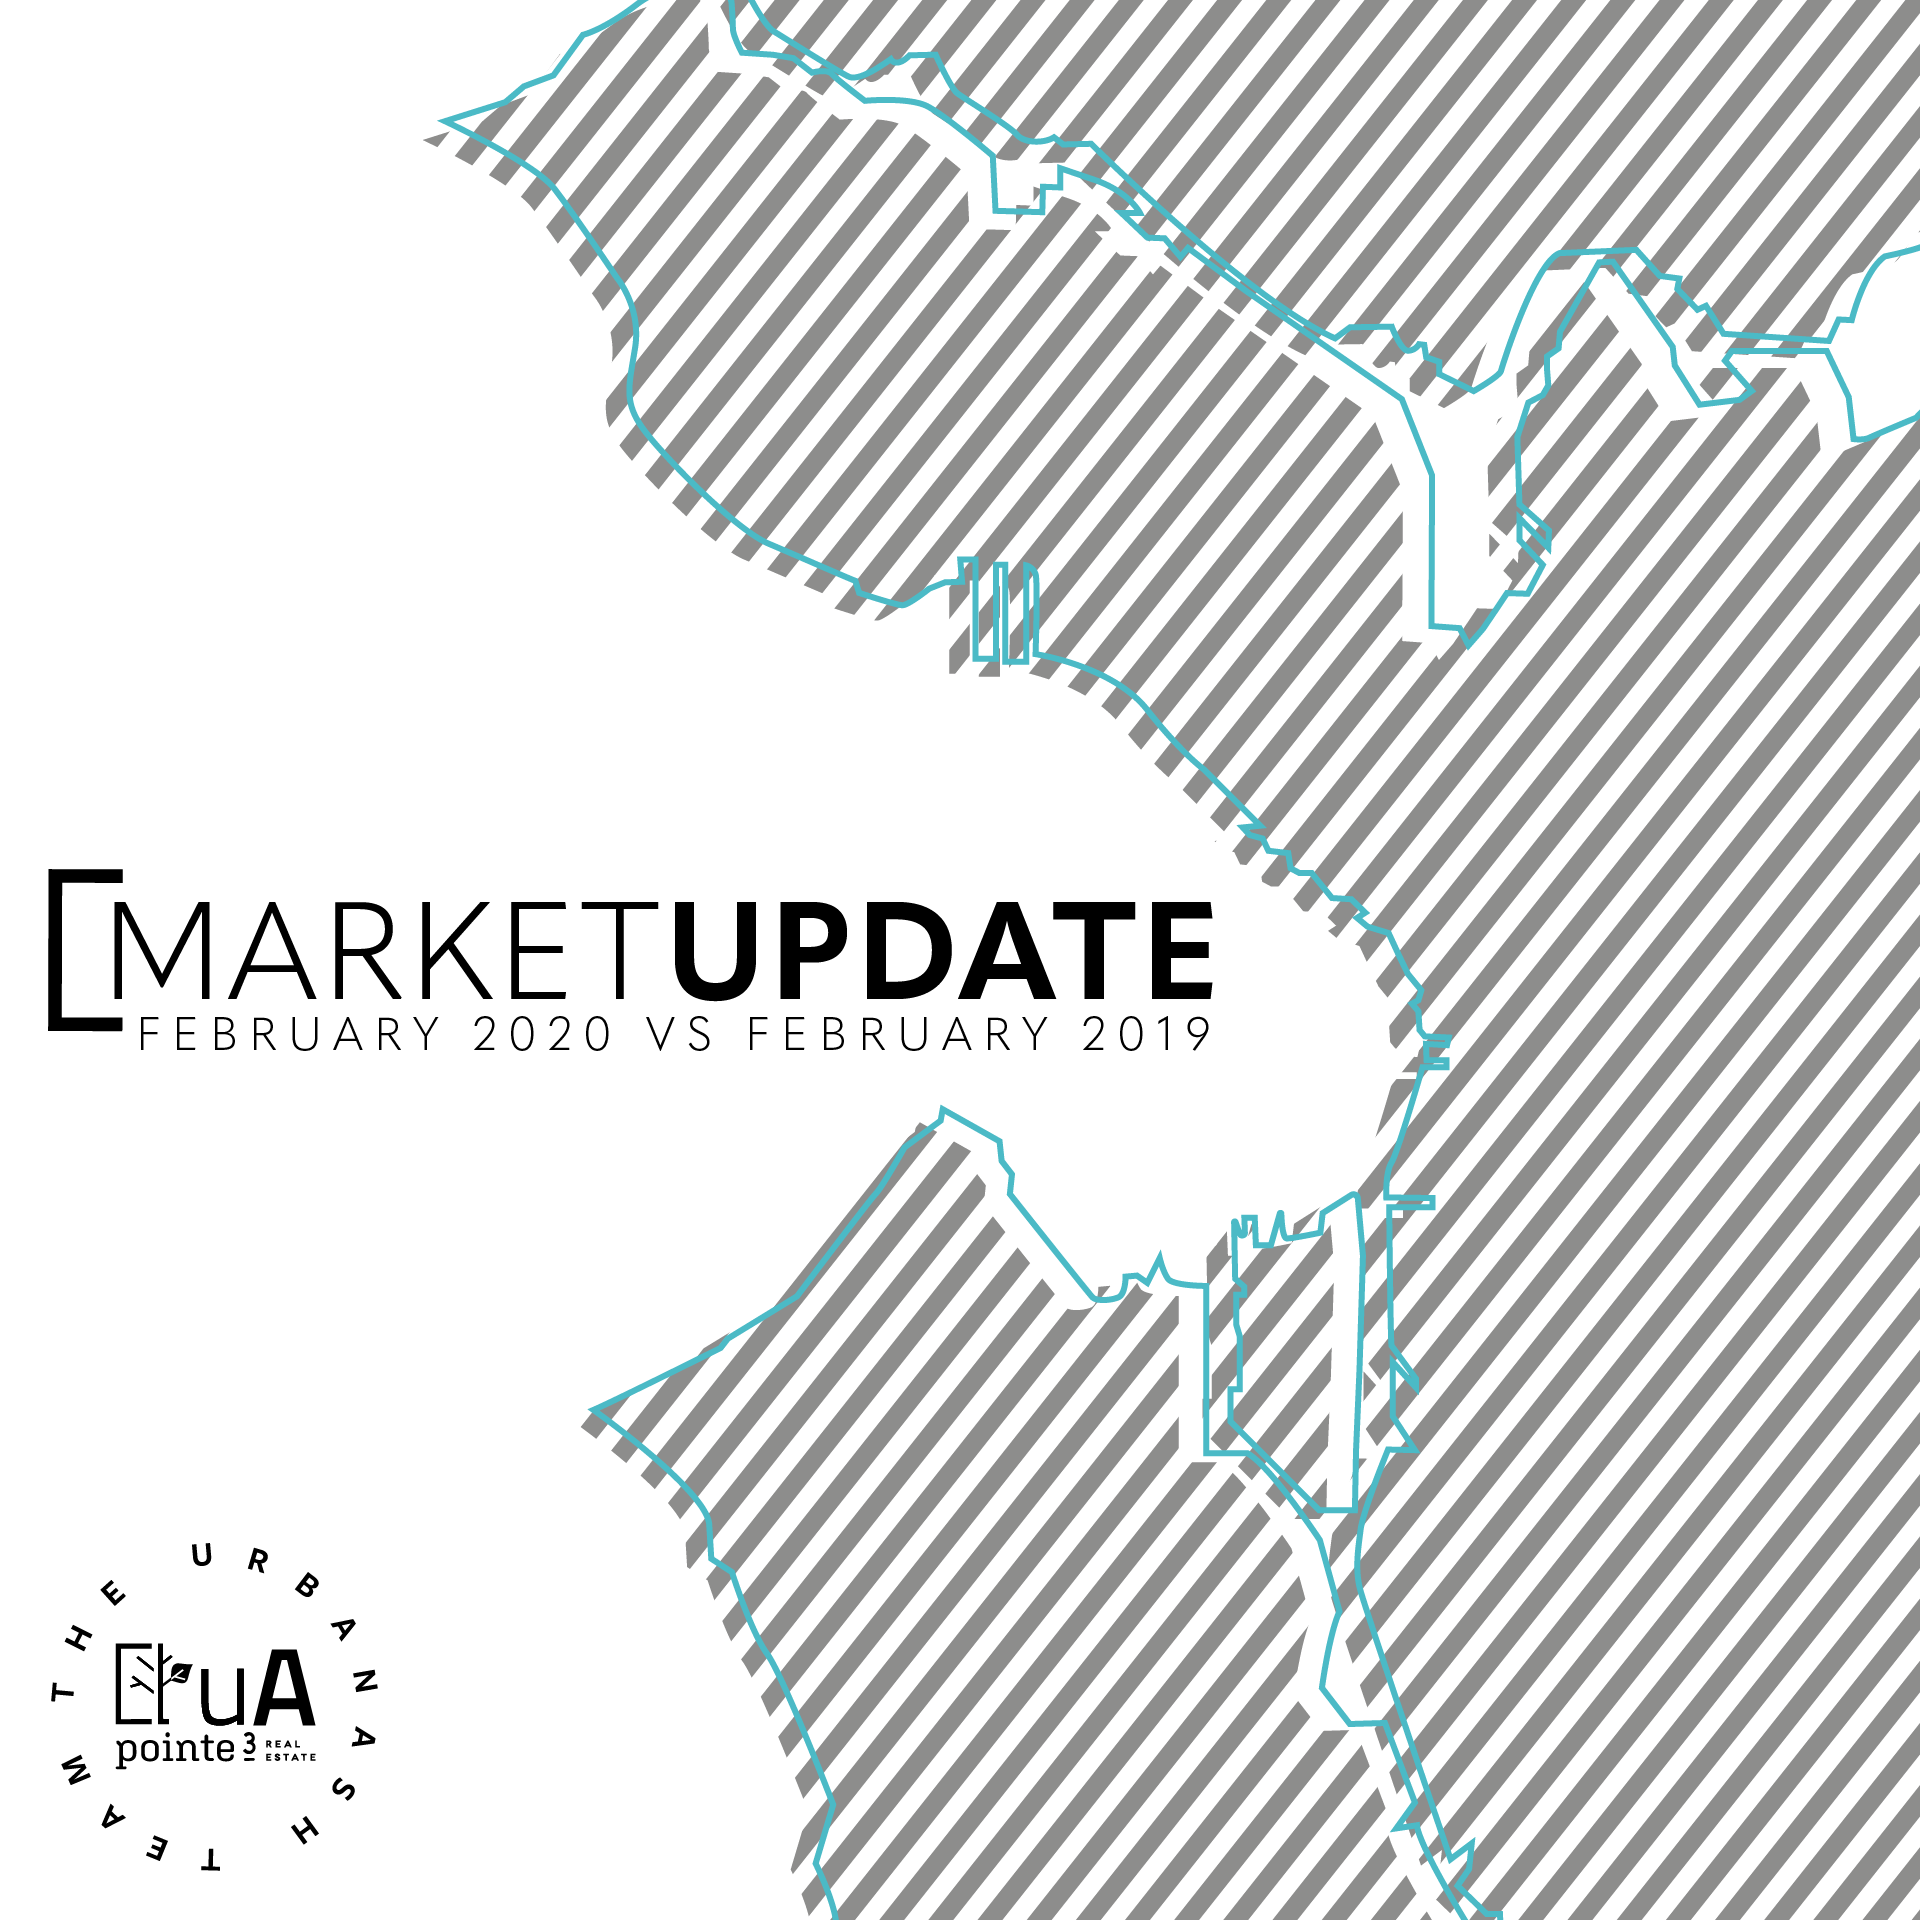 Market Update - February 2020